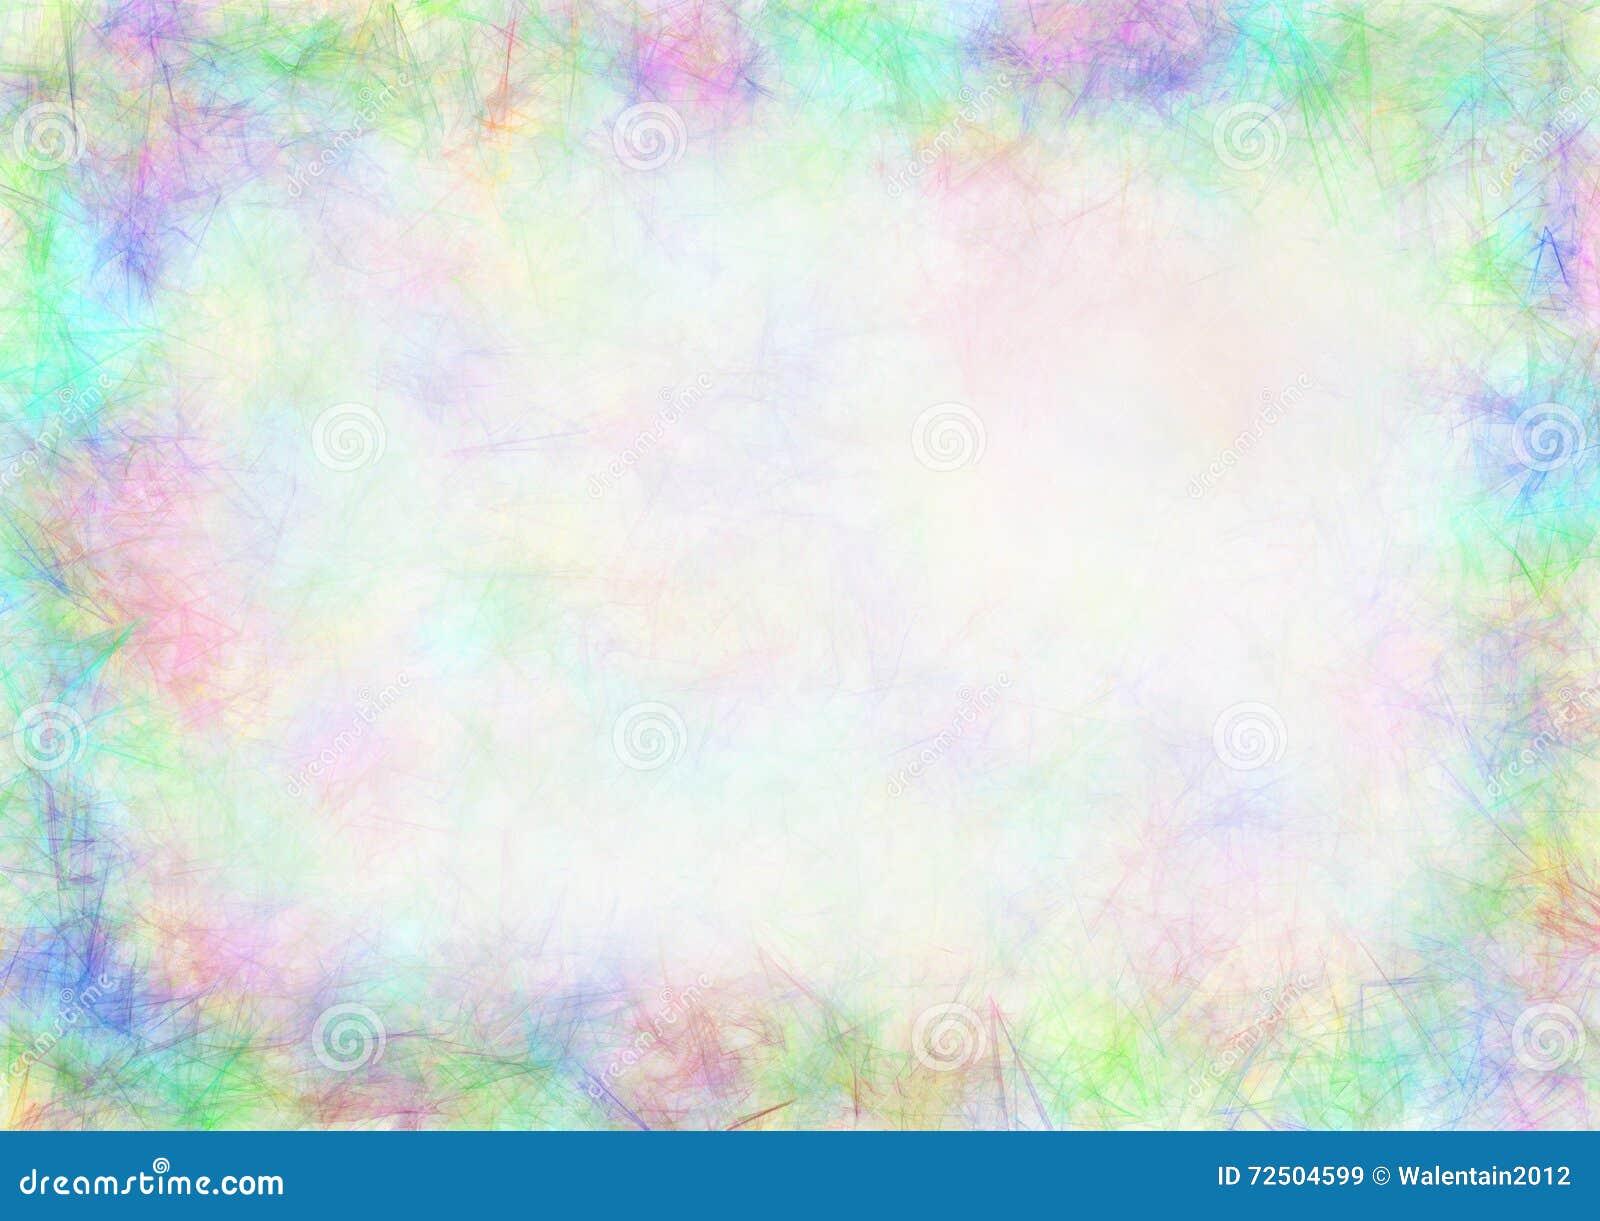 Pastelkleur getrokken geweven achtergrond